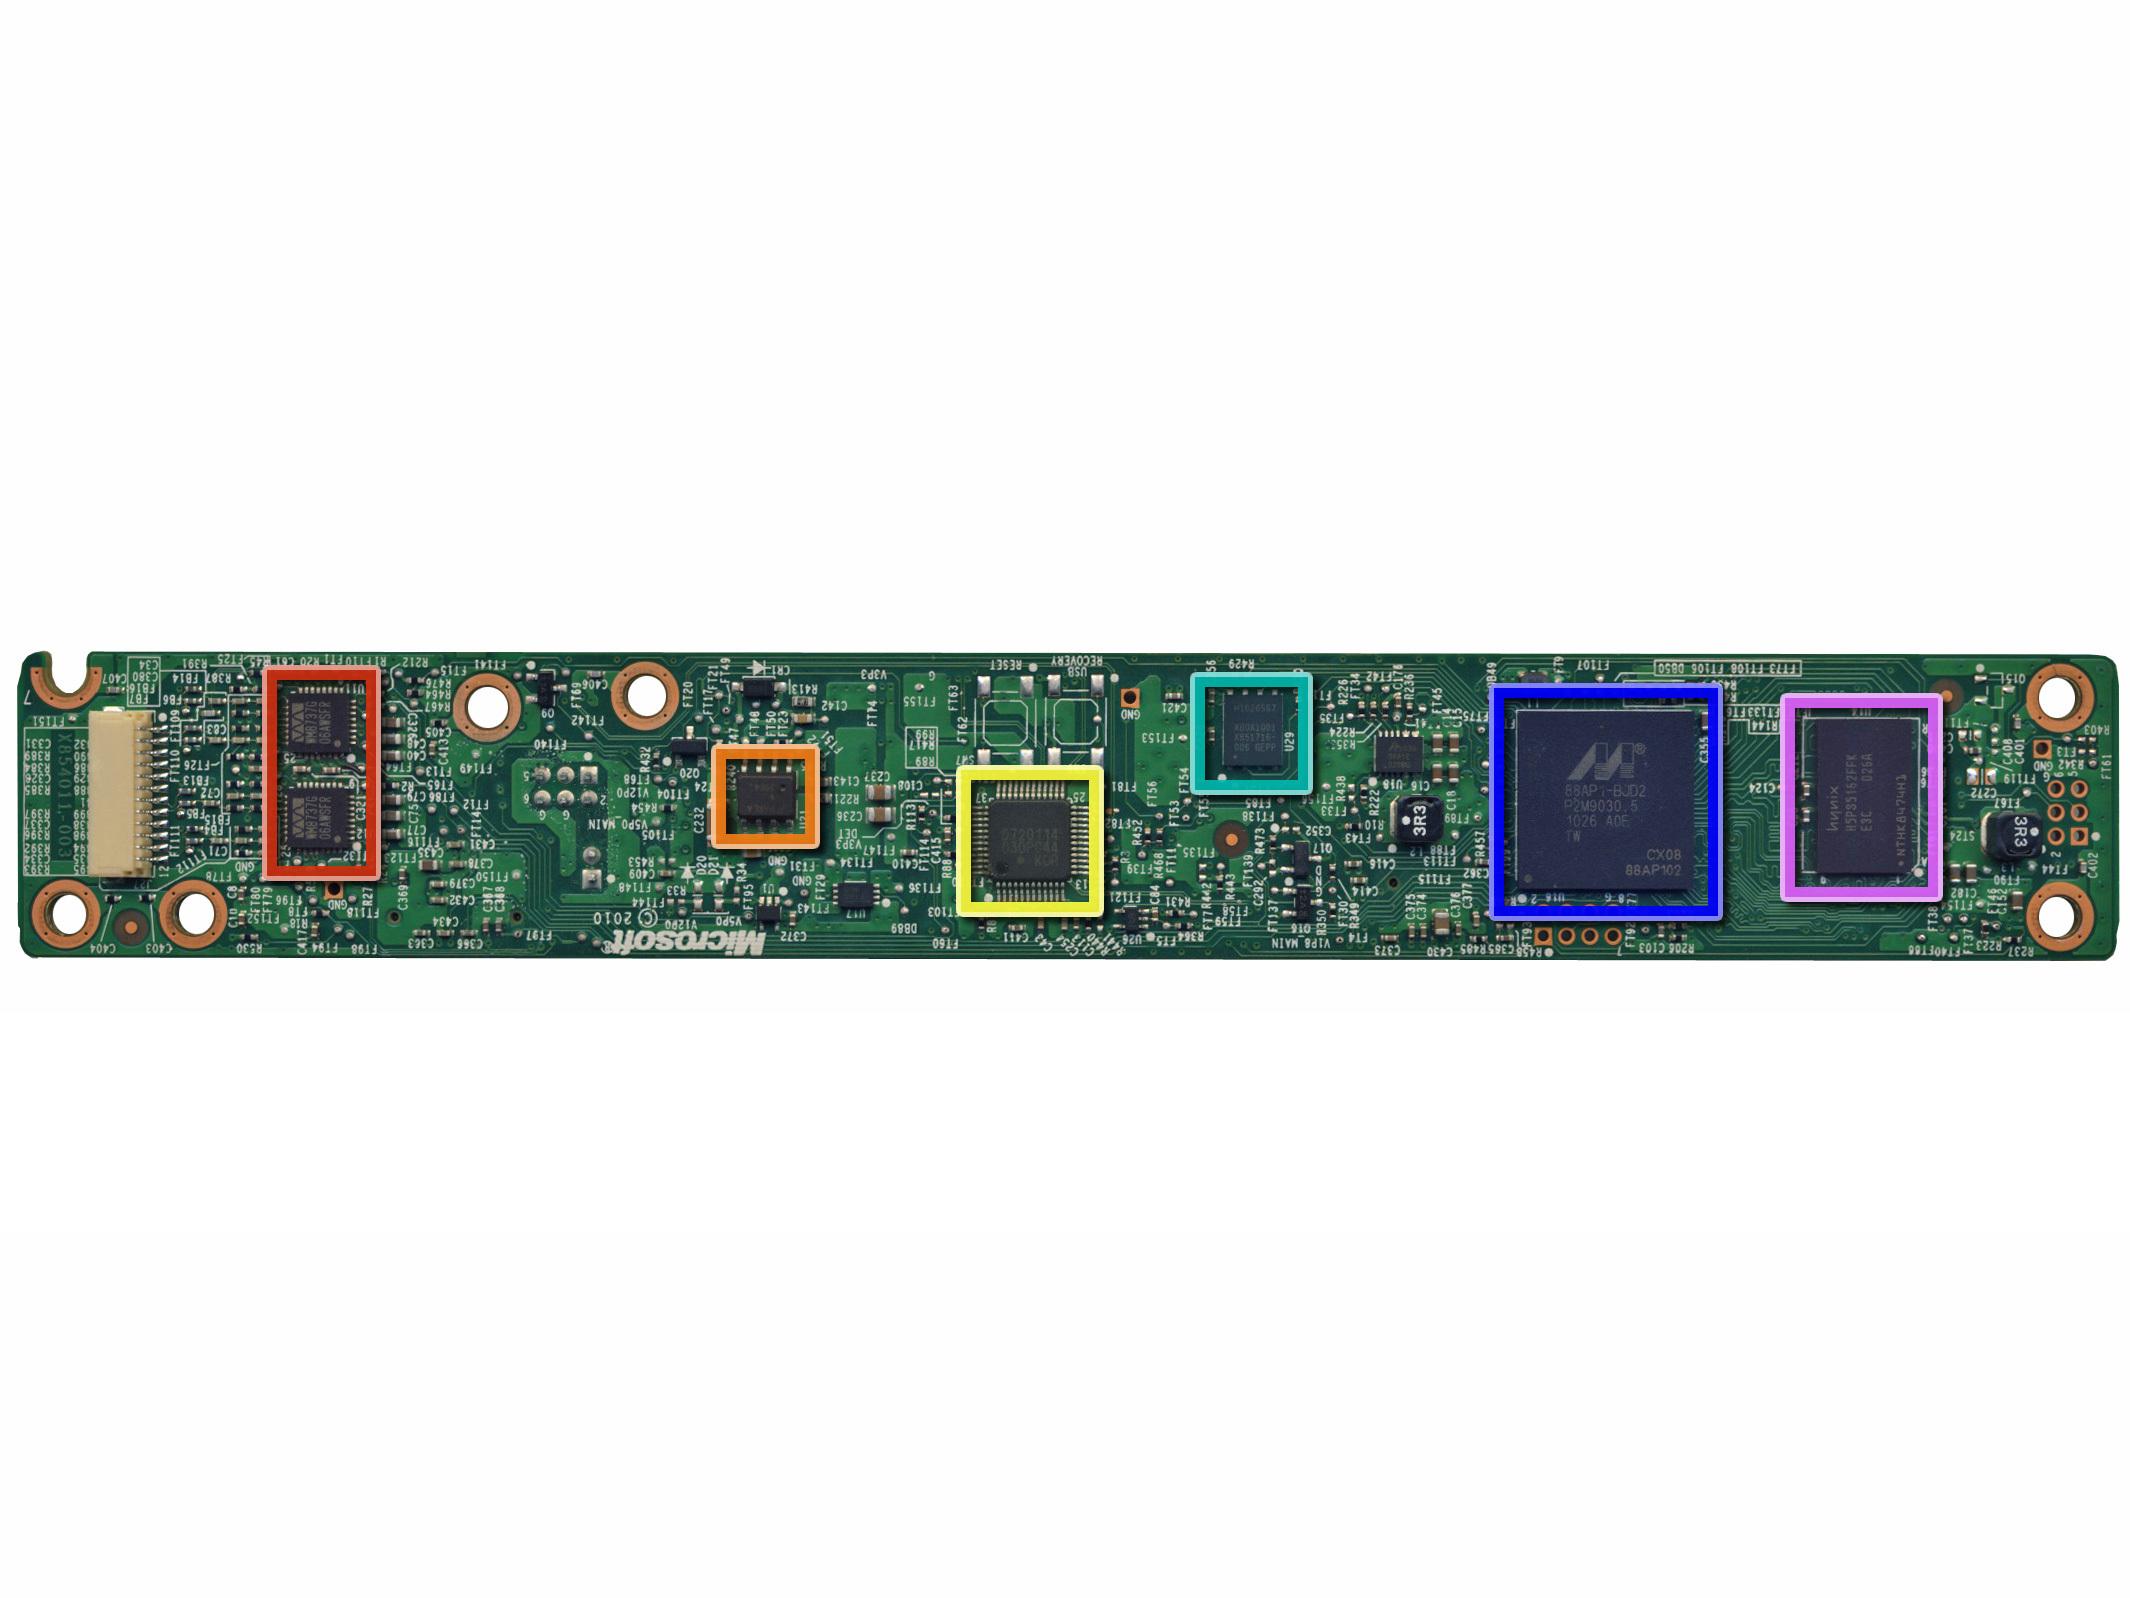 Xbox 360 Kinect Teardown iFixit – Kinect Sensor Wiring Diagram